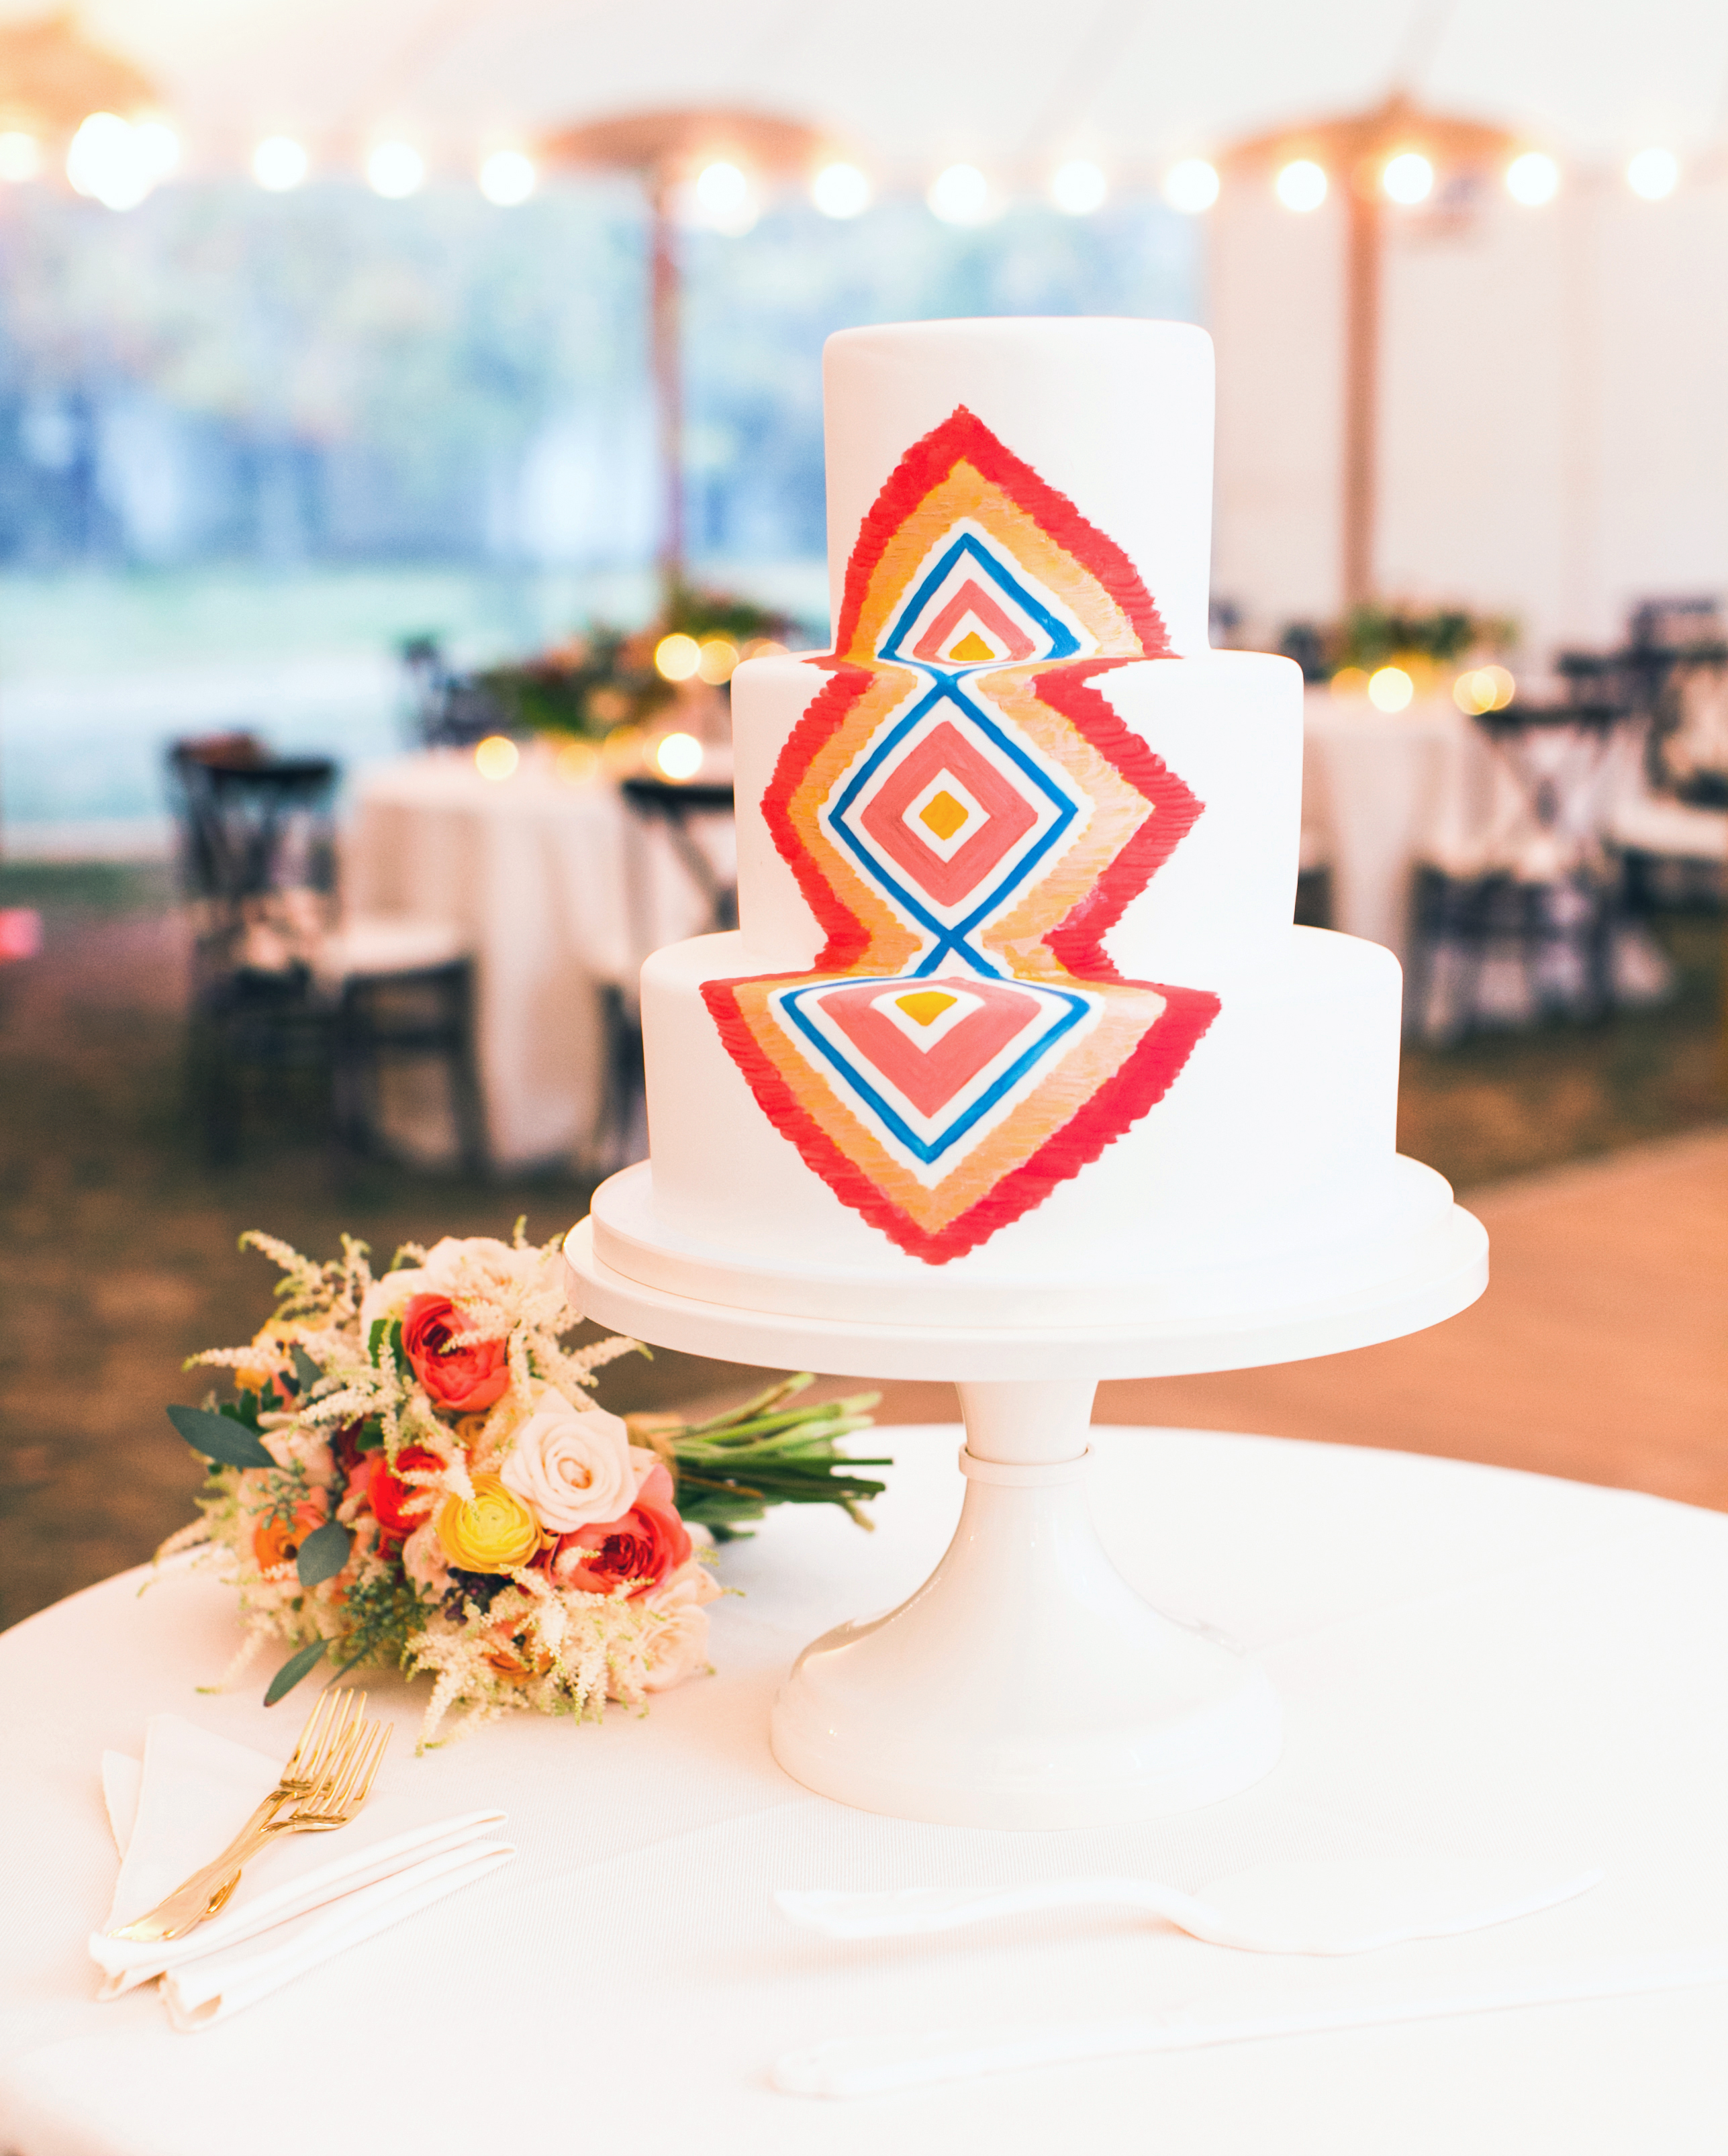 brittany-andrew-wedding-cake-079-s112067-0715.jpg